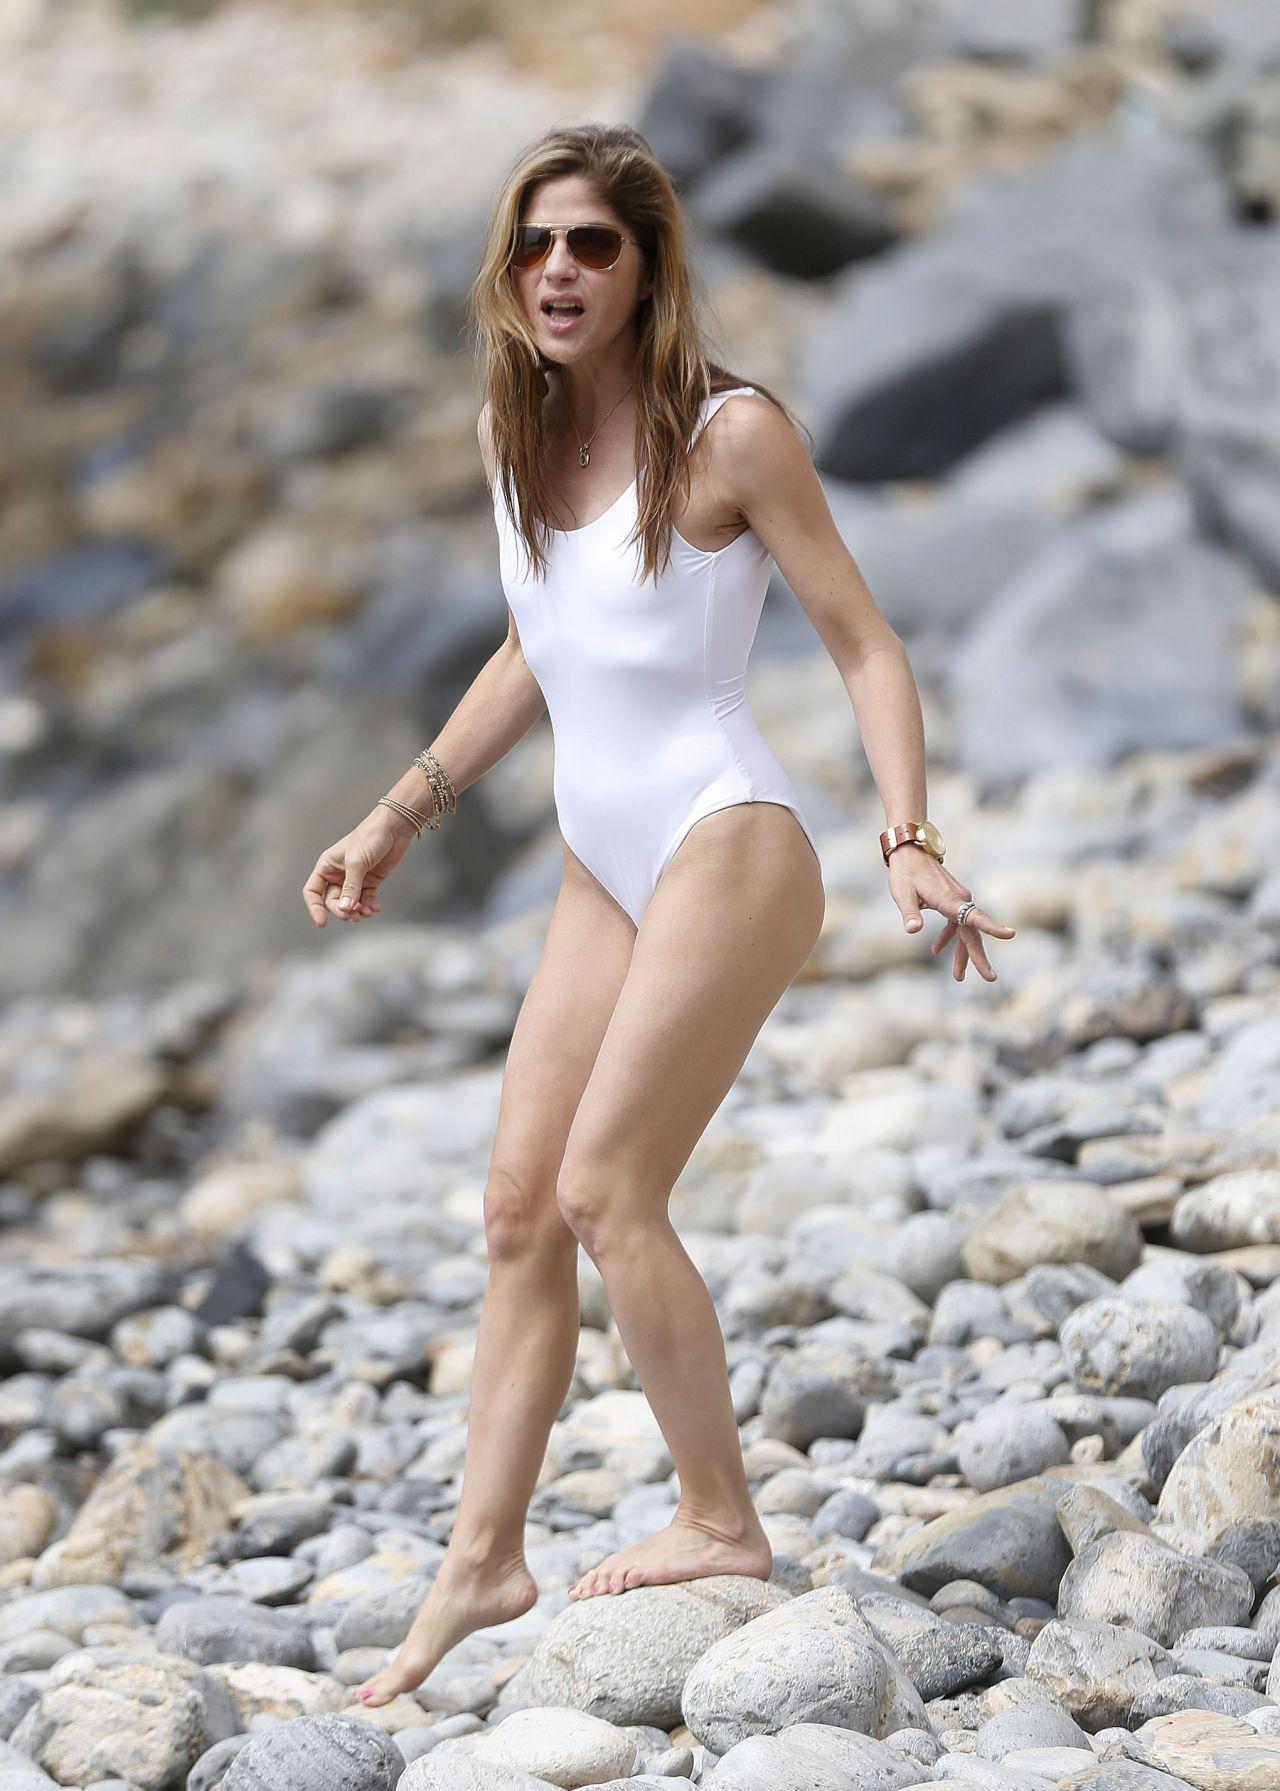 Selma Blair In White Swimsuit At The Beach In Palos Verdes